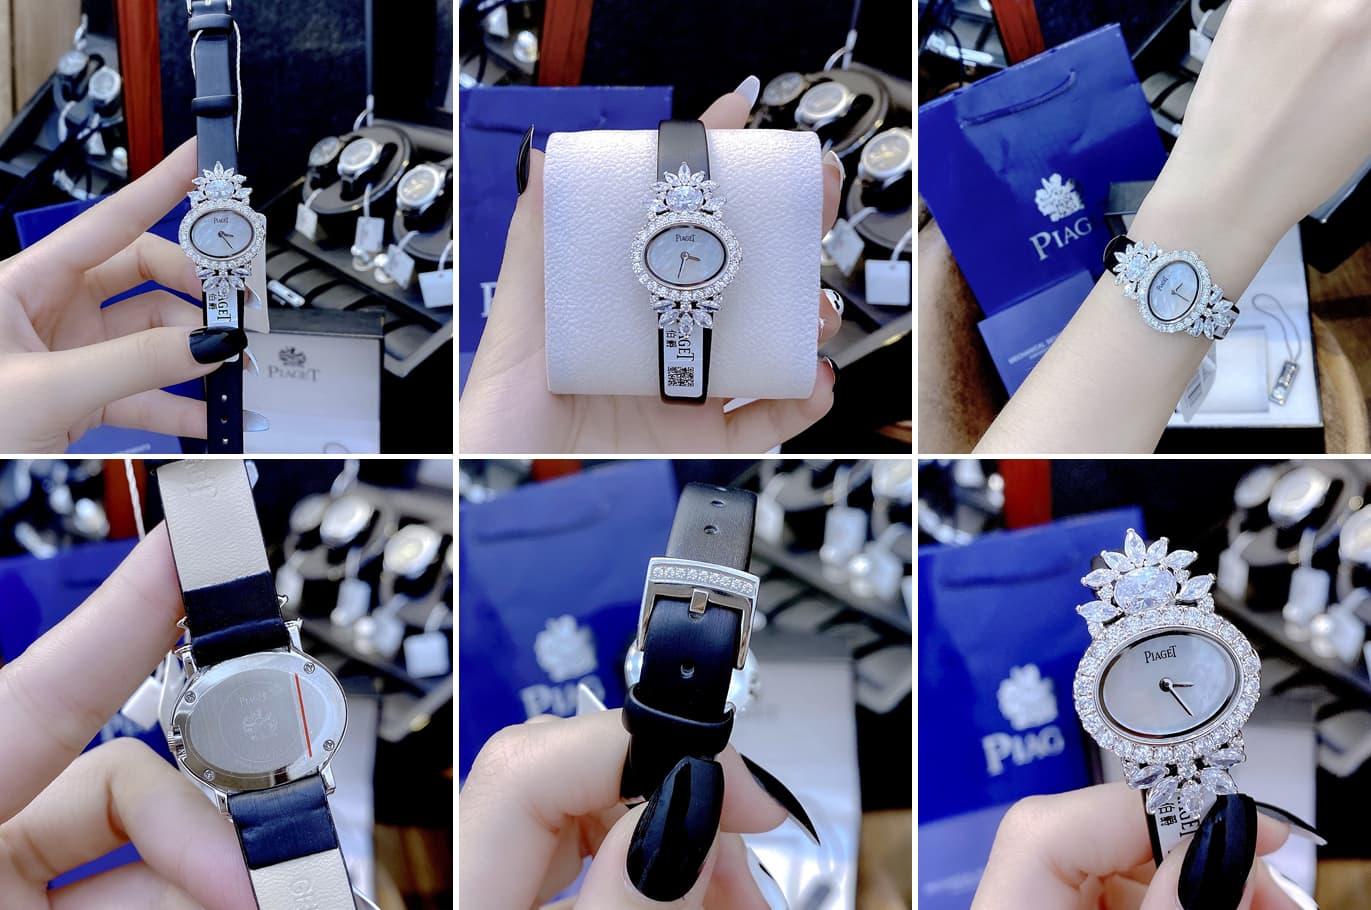 Hinh-anh--thuc-te-Dong-ho-PIAGET-WHITE-GOLD-SAPPHIRE-DIAMOND-LUXURY